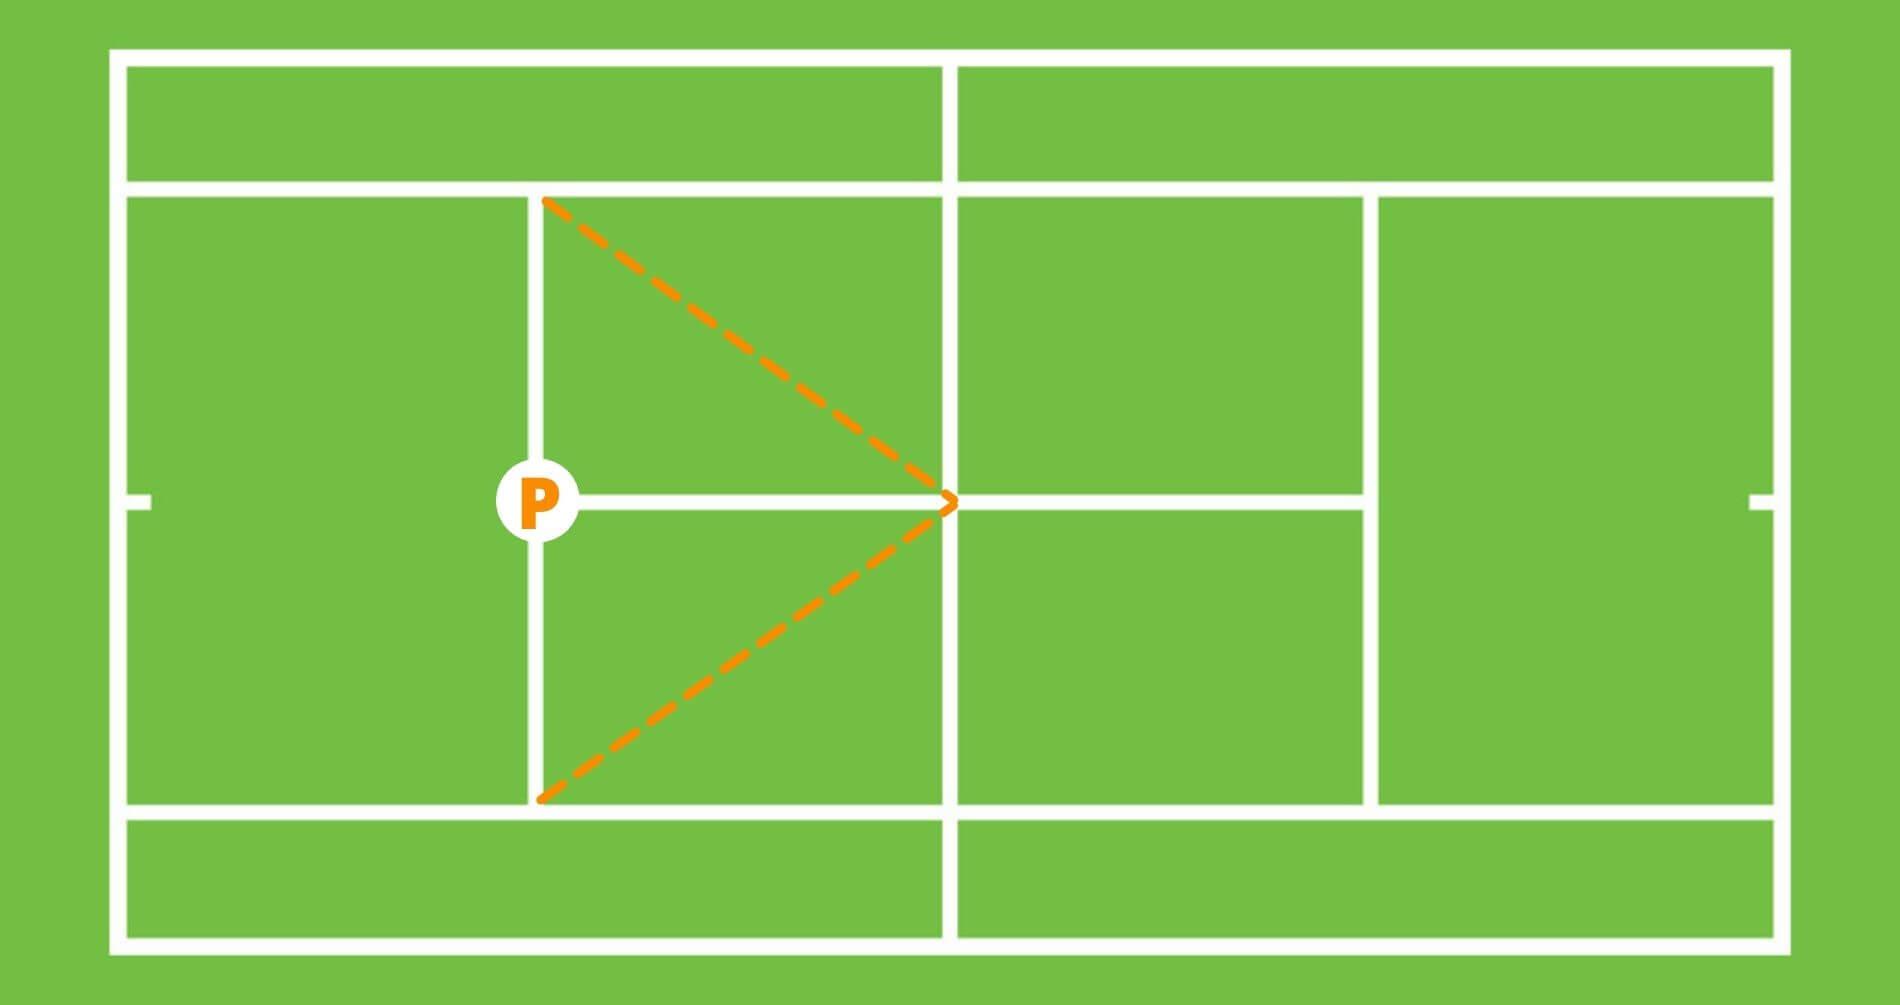 tennis v volley drill setup